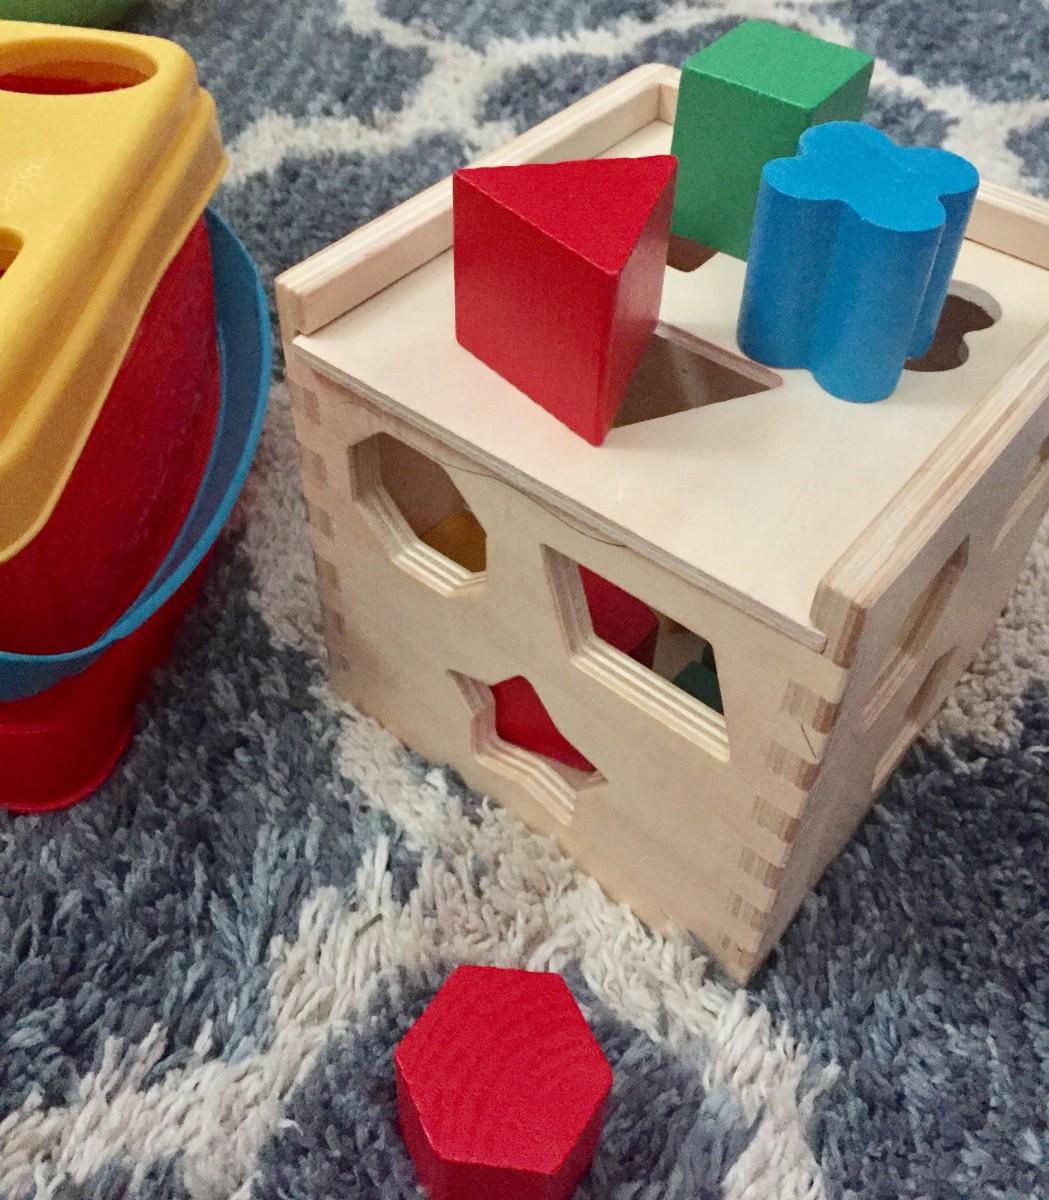 shape-sorting-toys